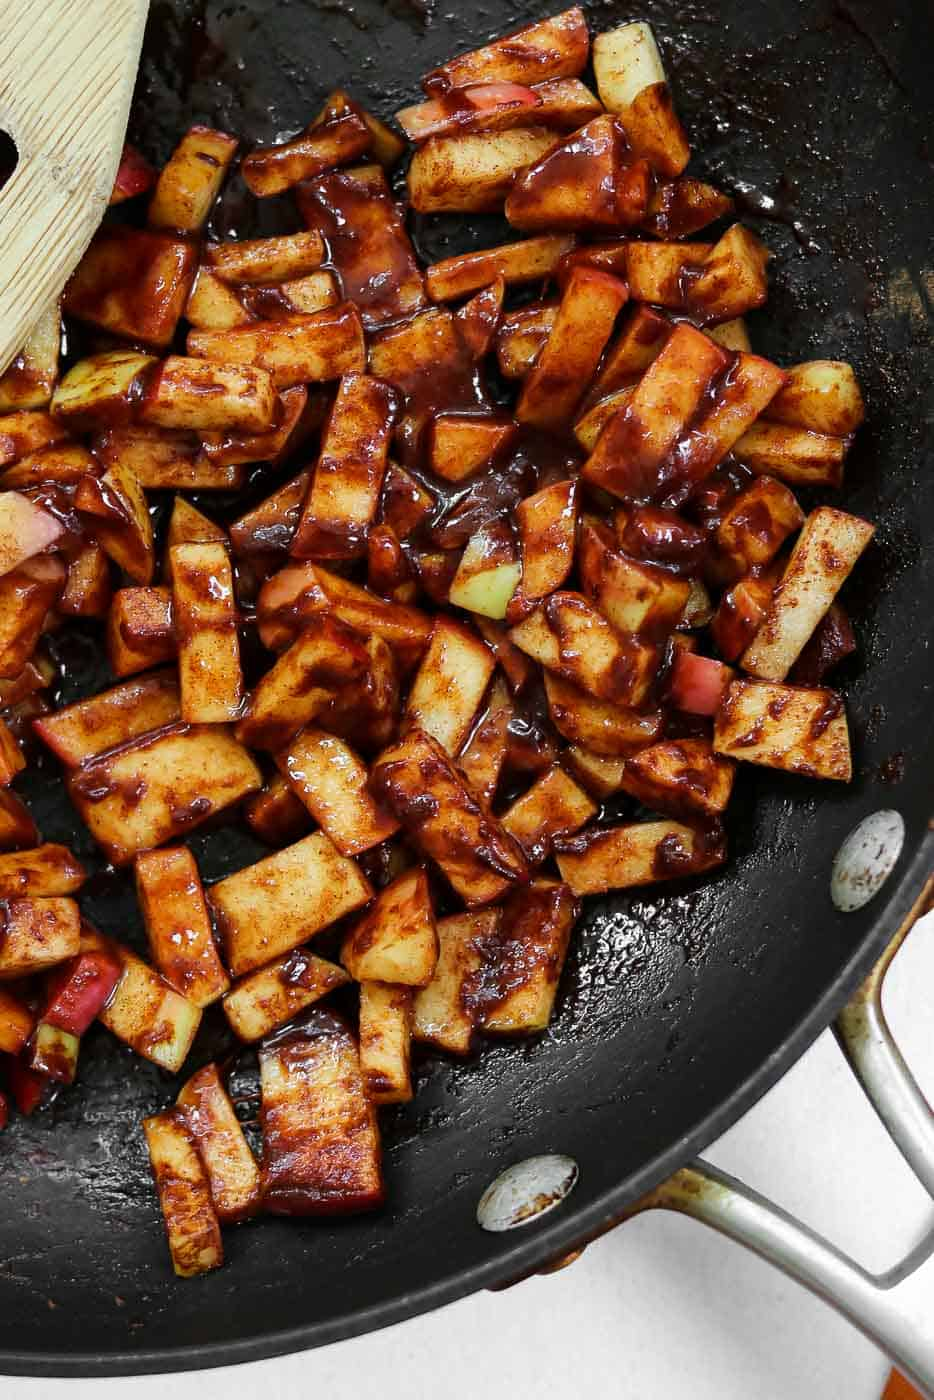 Chopped cinnamon apples in a black pan.